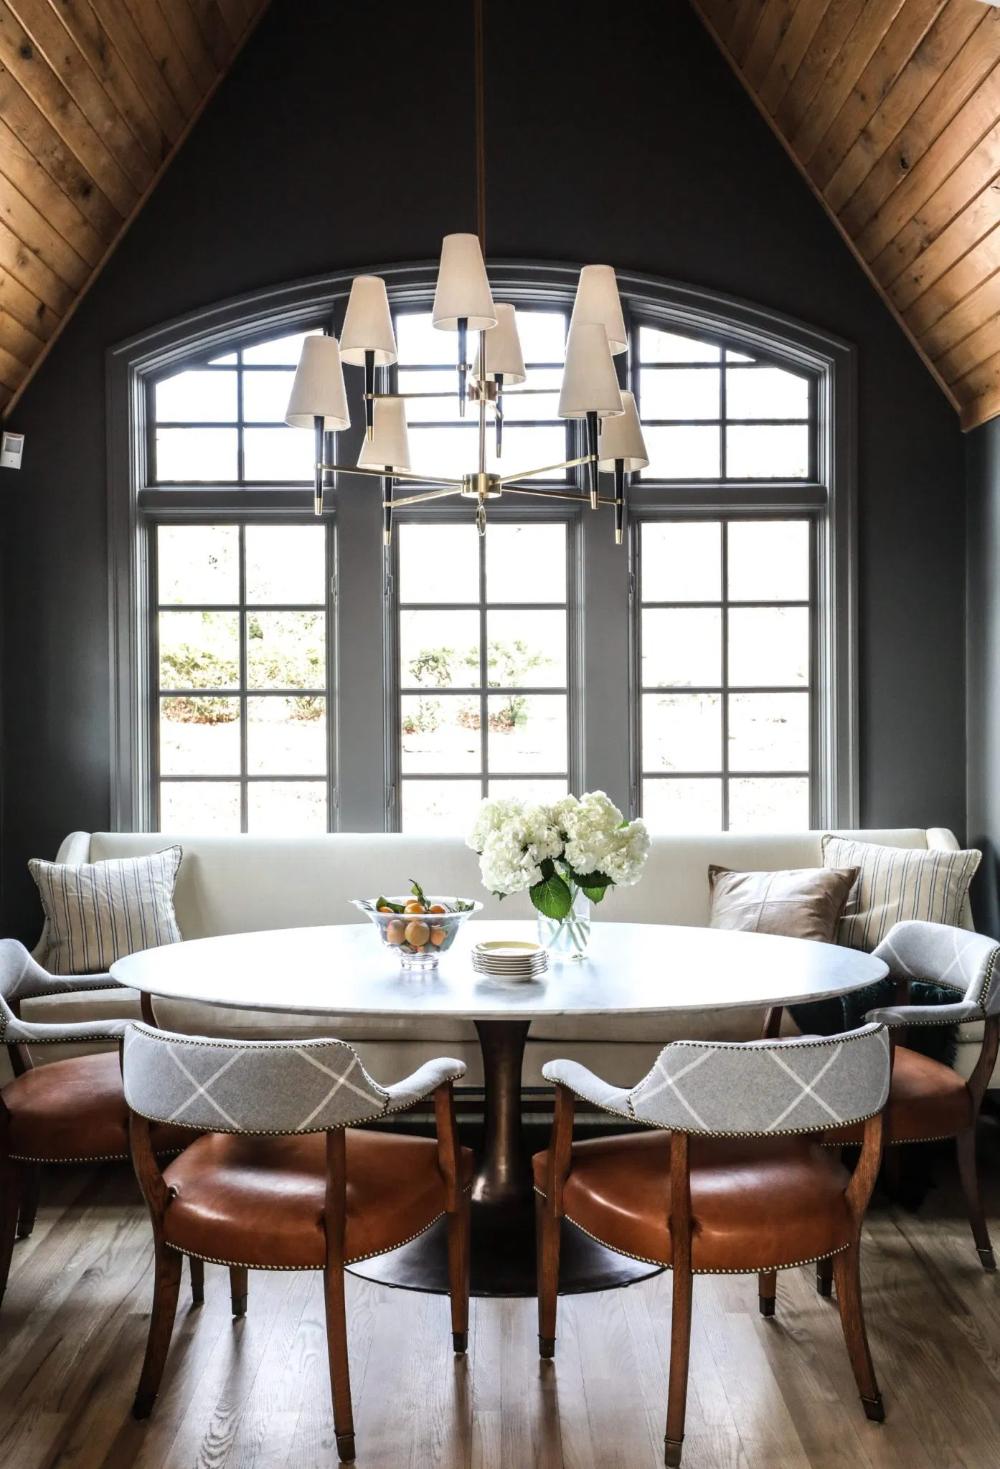 Breakfast Nooks Park And Oak Interior Design Home Decor Home Dining Room Design